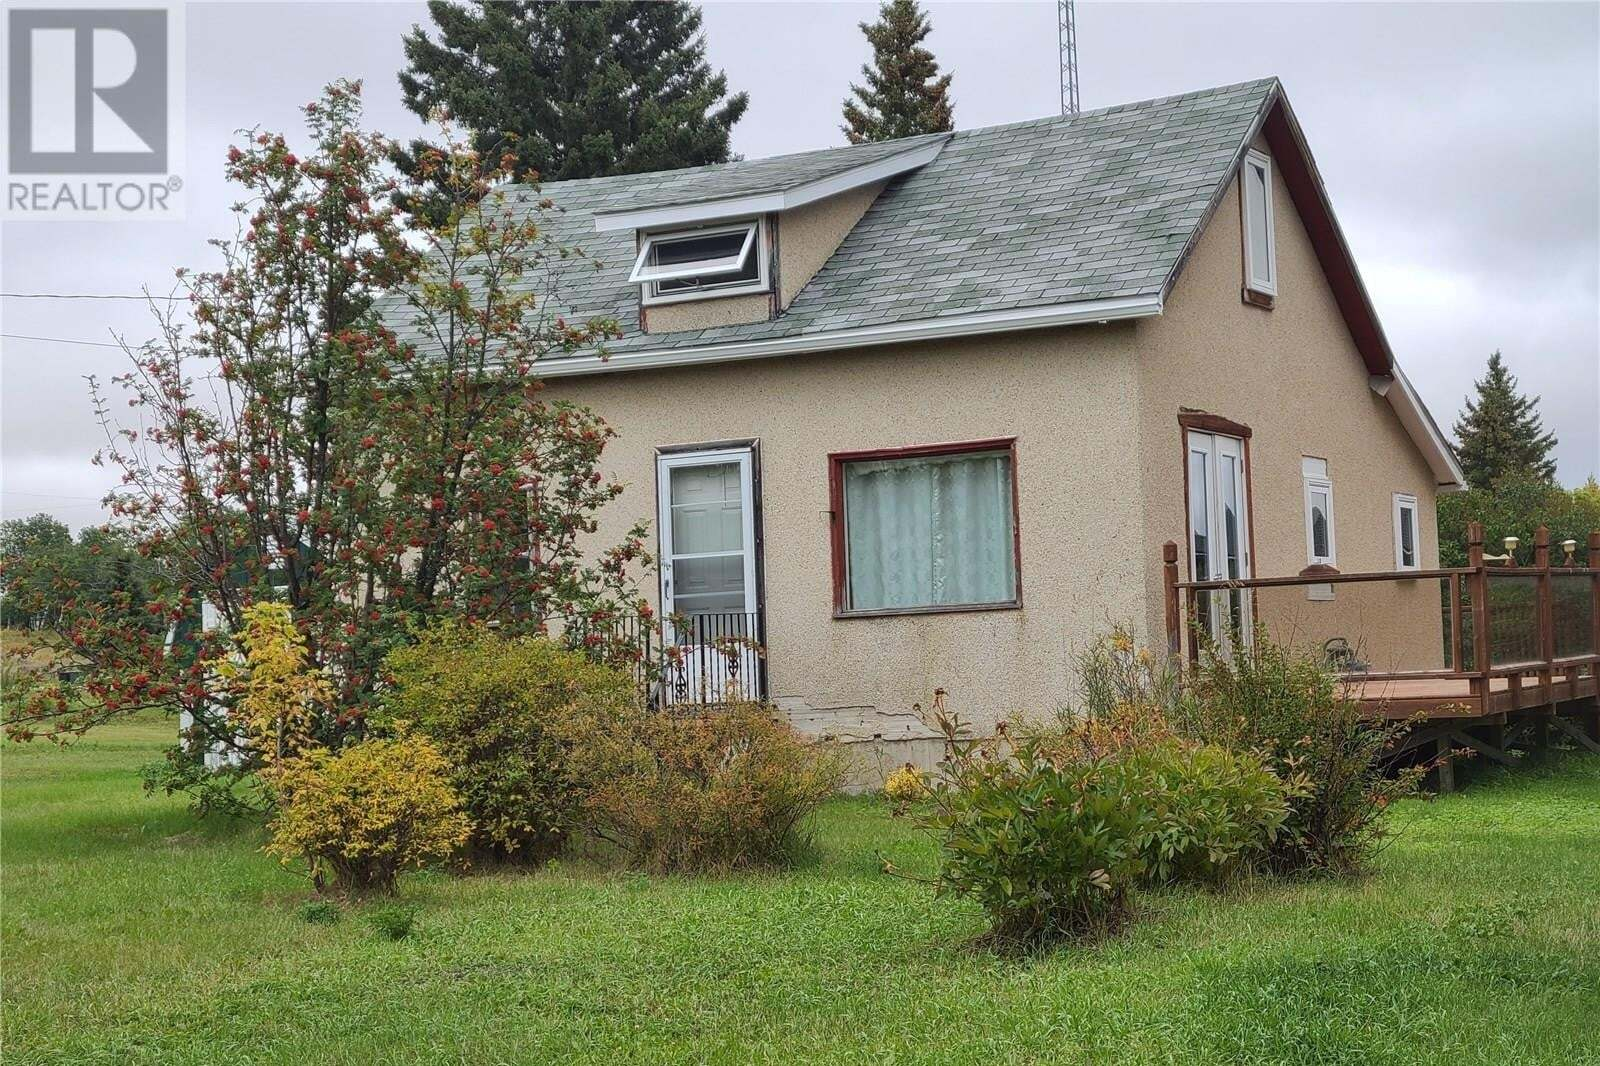 House for sale at 301 1st St E Bjorkdale Saskatchewan - MLS: SK827158